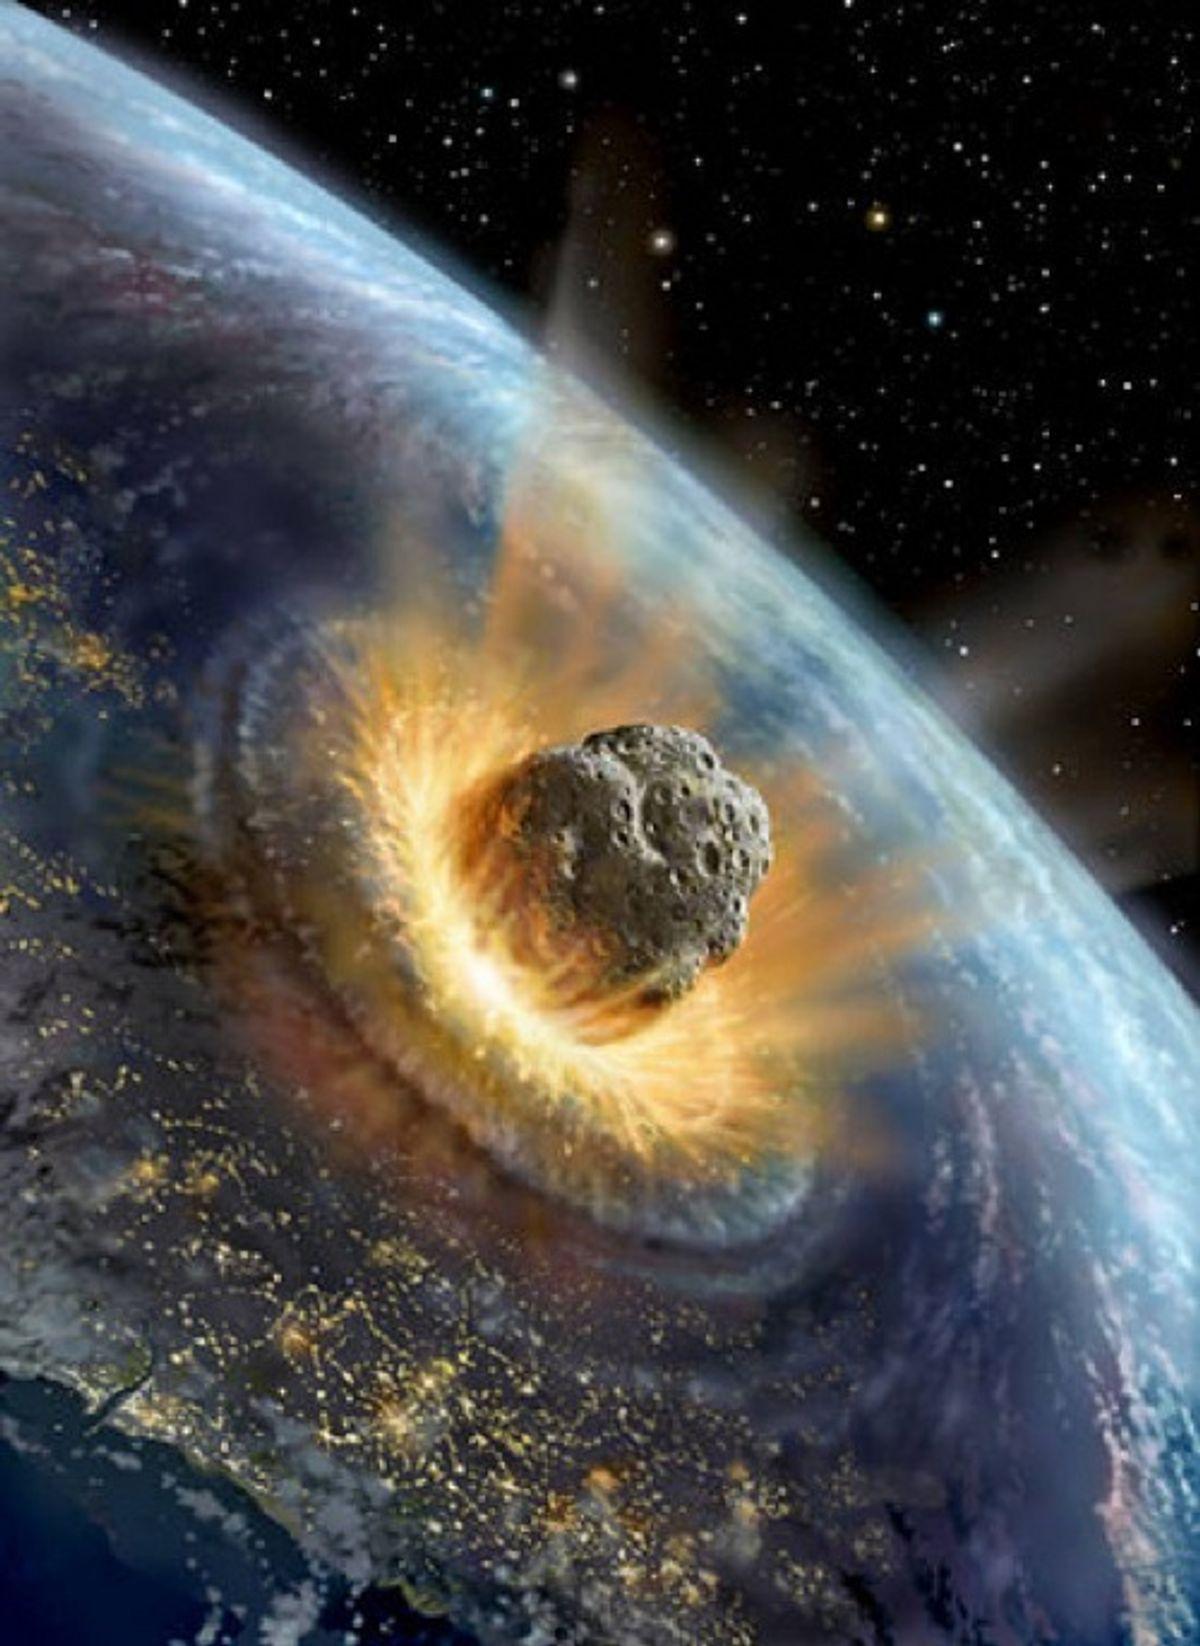 Dramatization of Apophis asteroid striking Earth